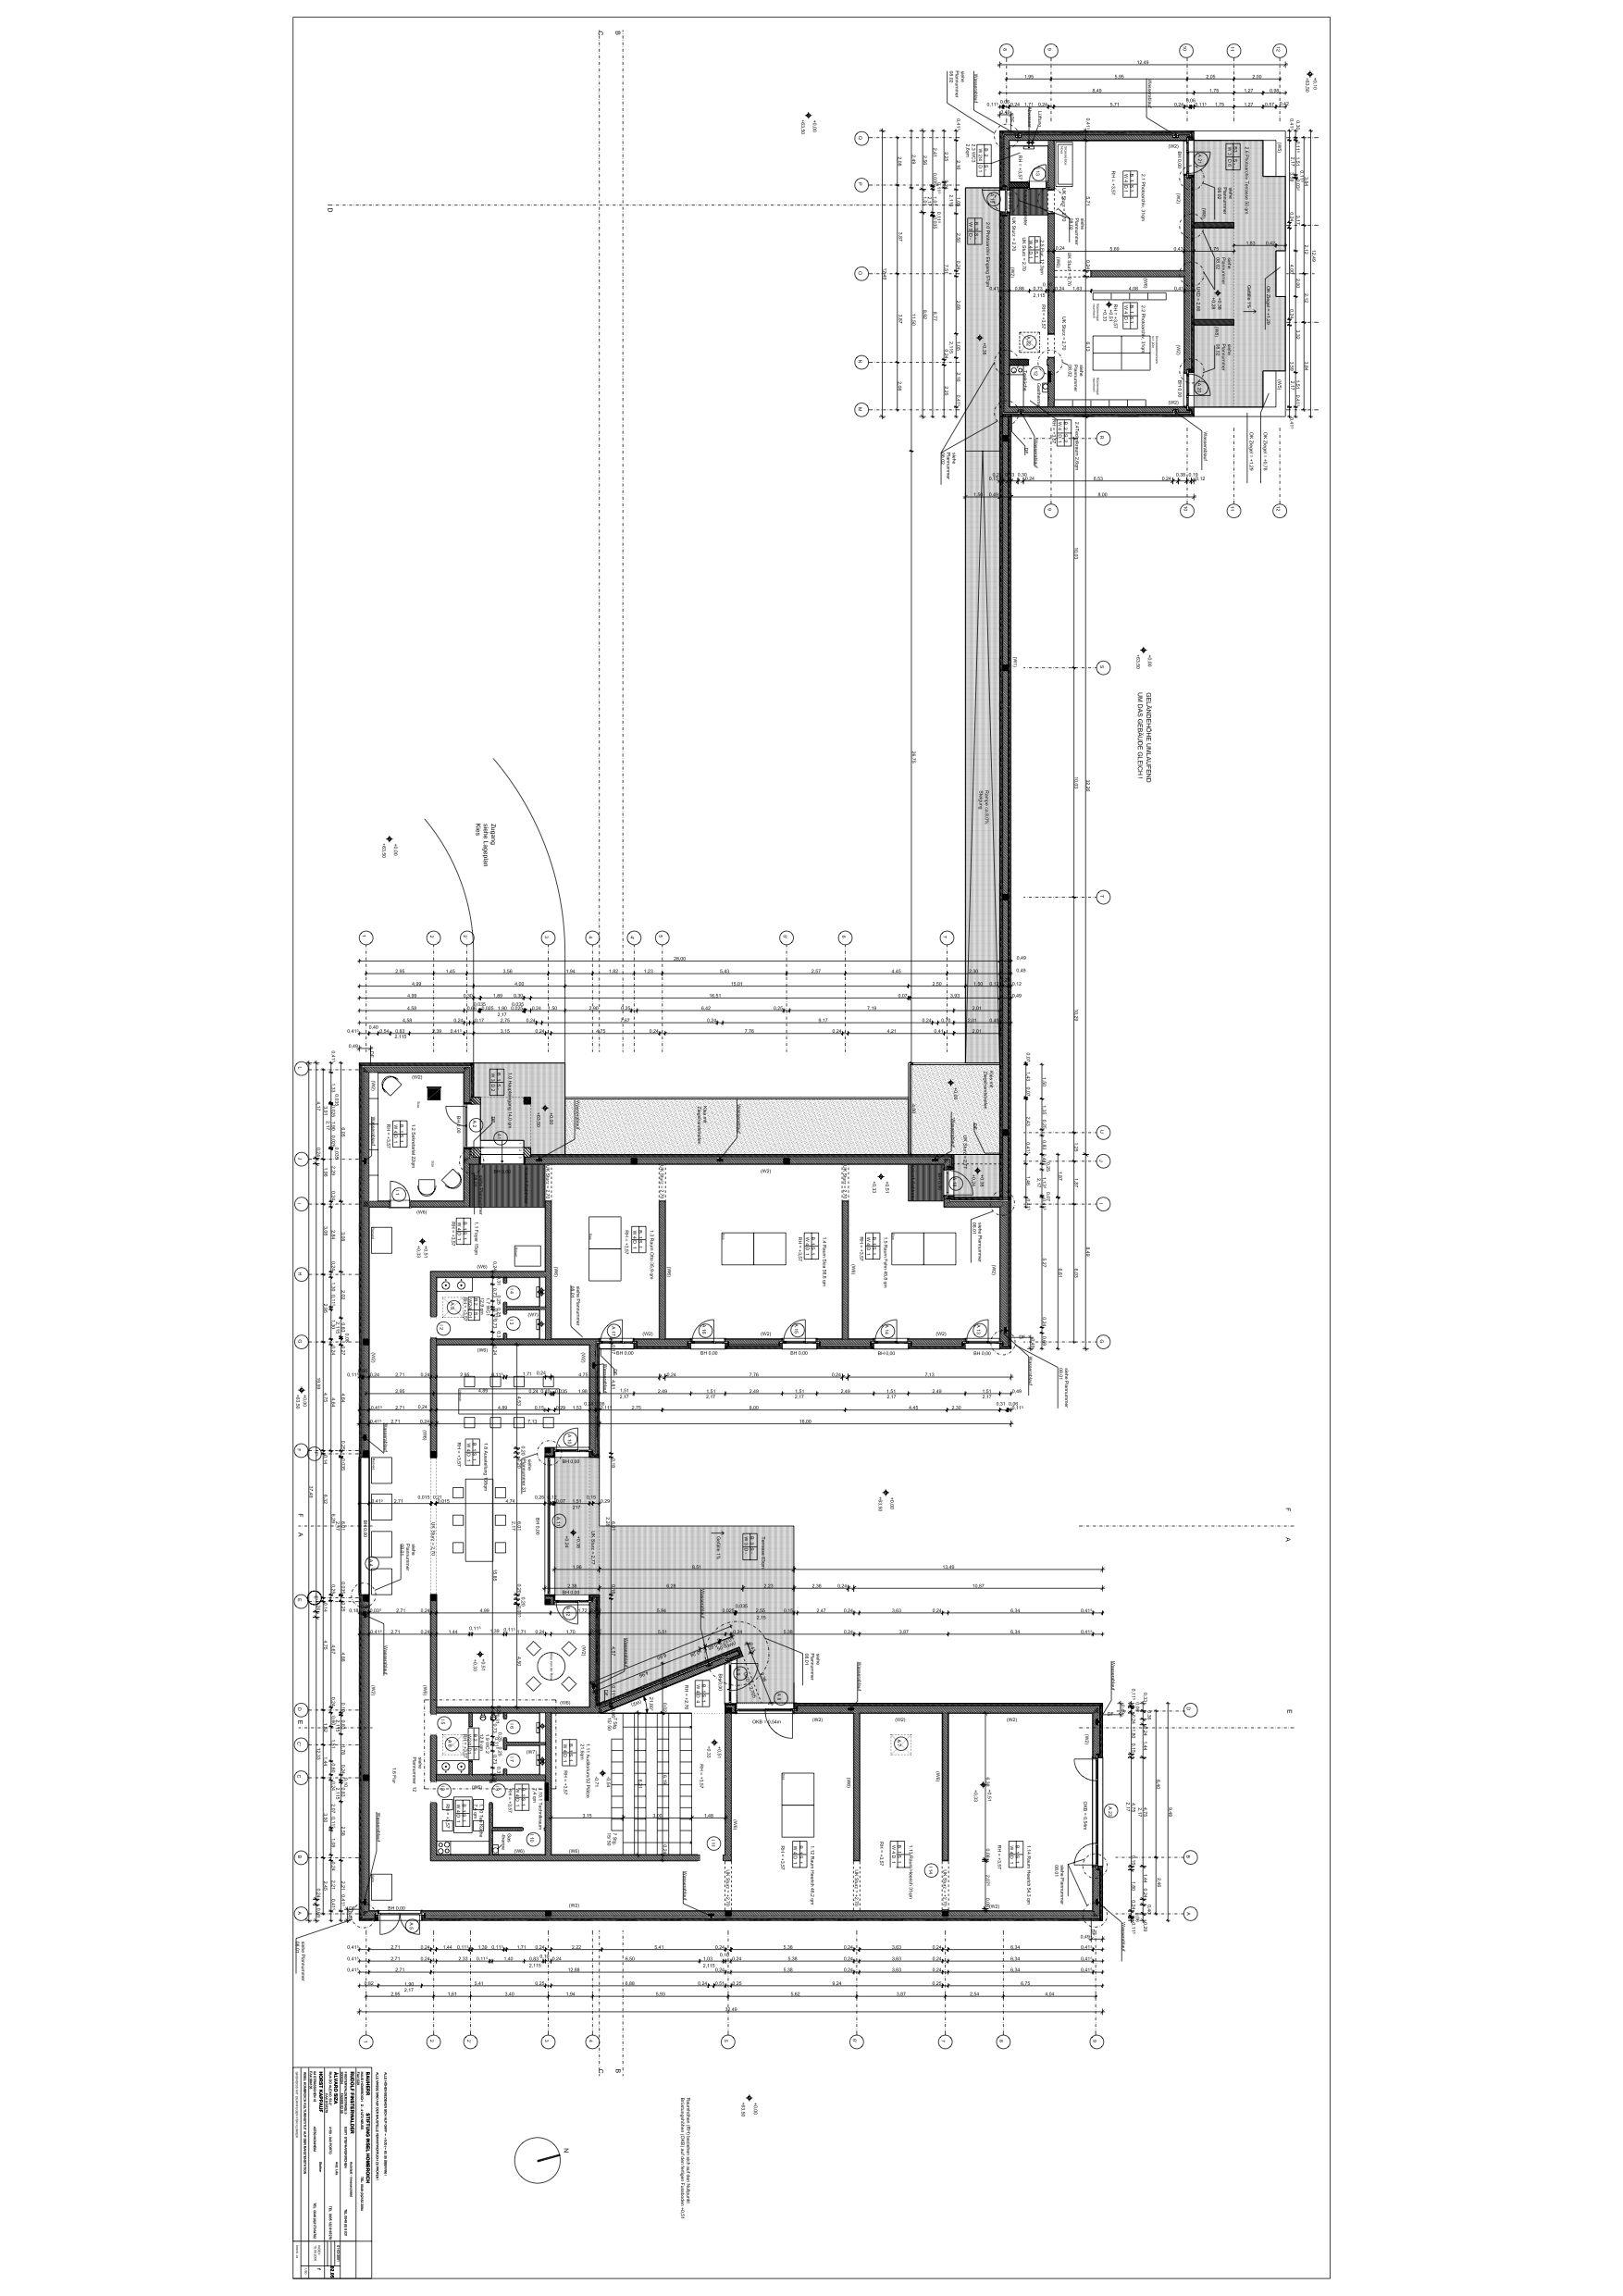 Alvaro Siza Instituts Fur Architektur Hombroich